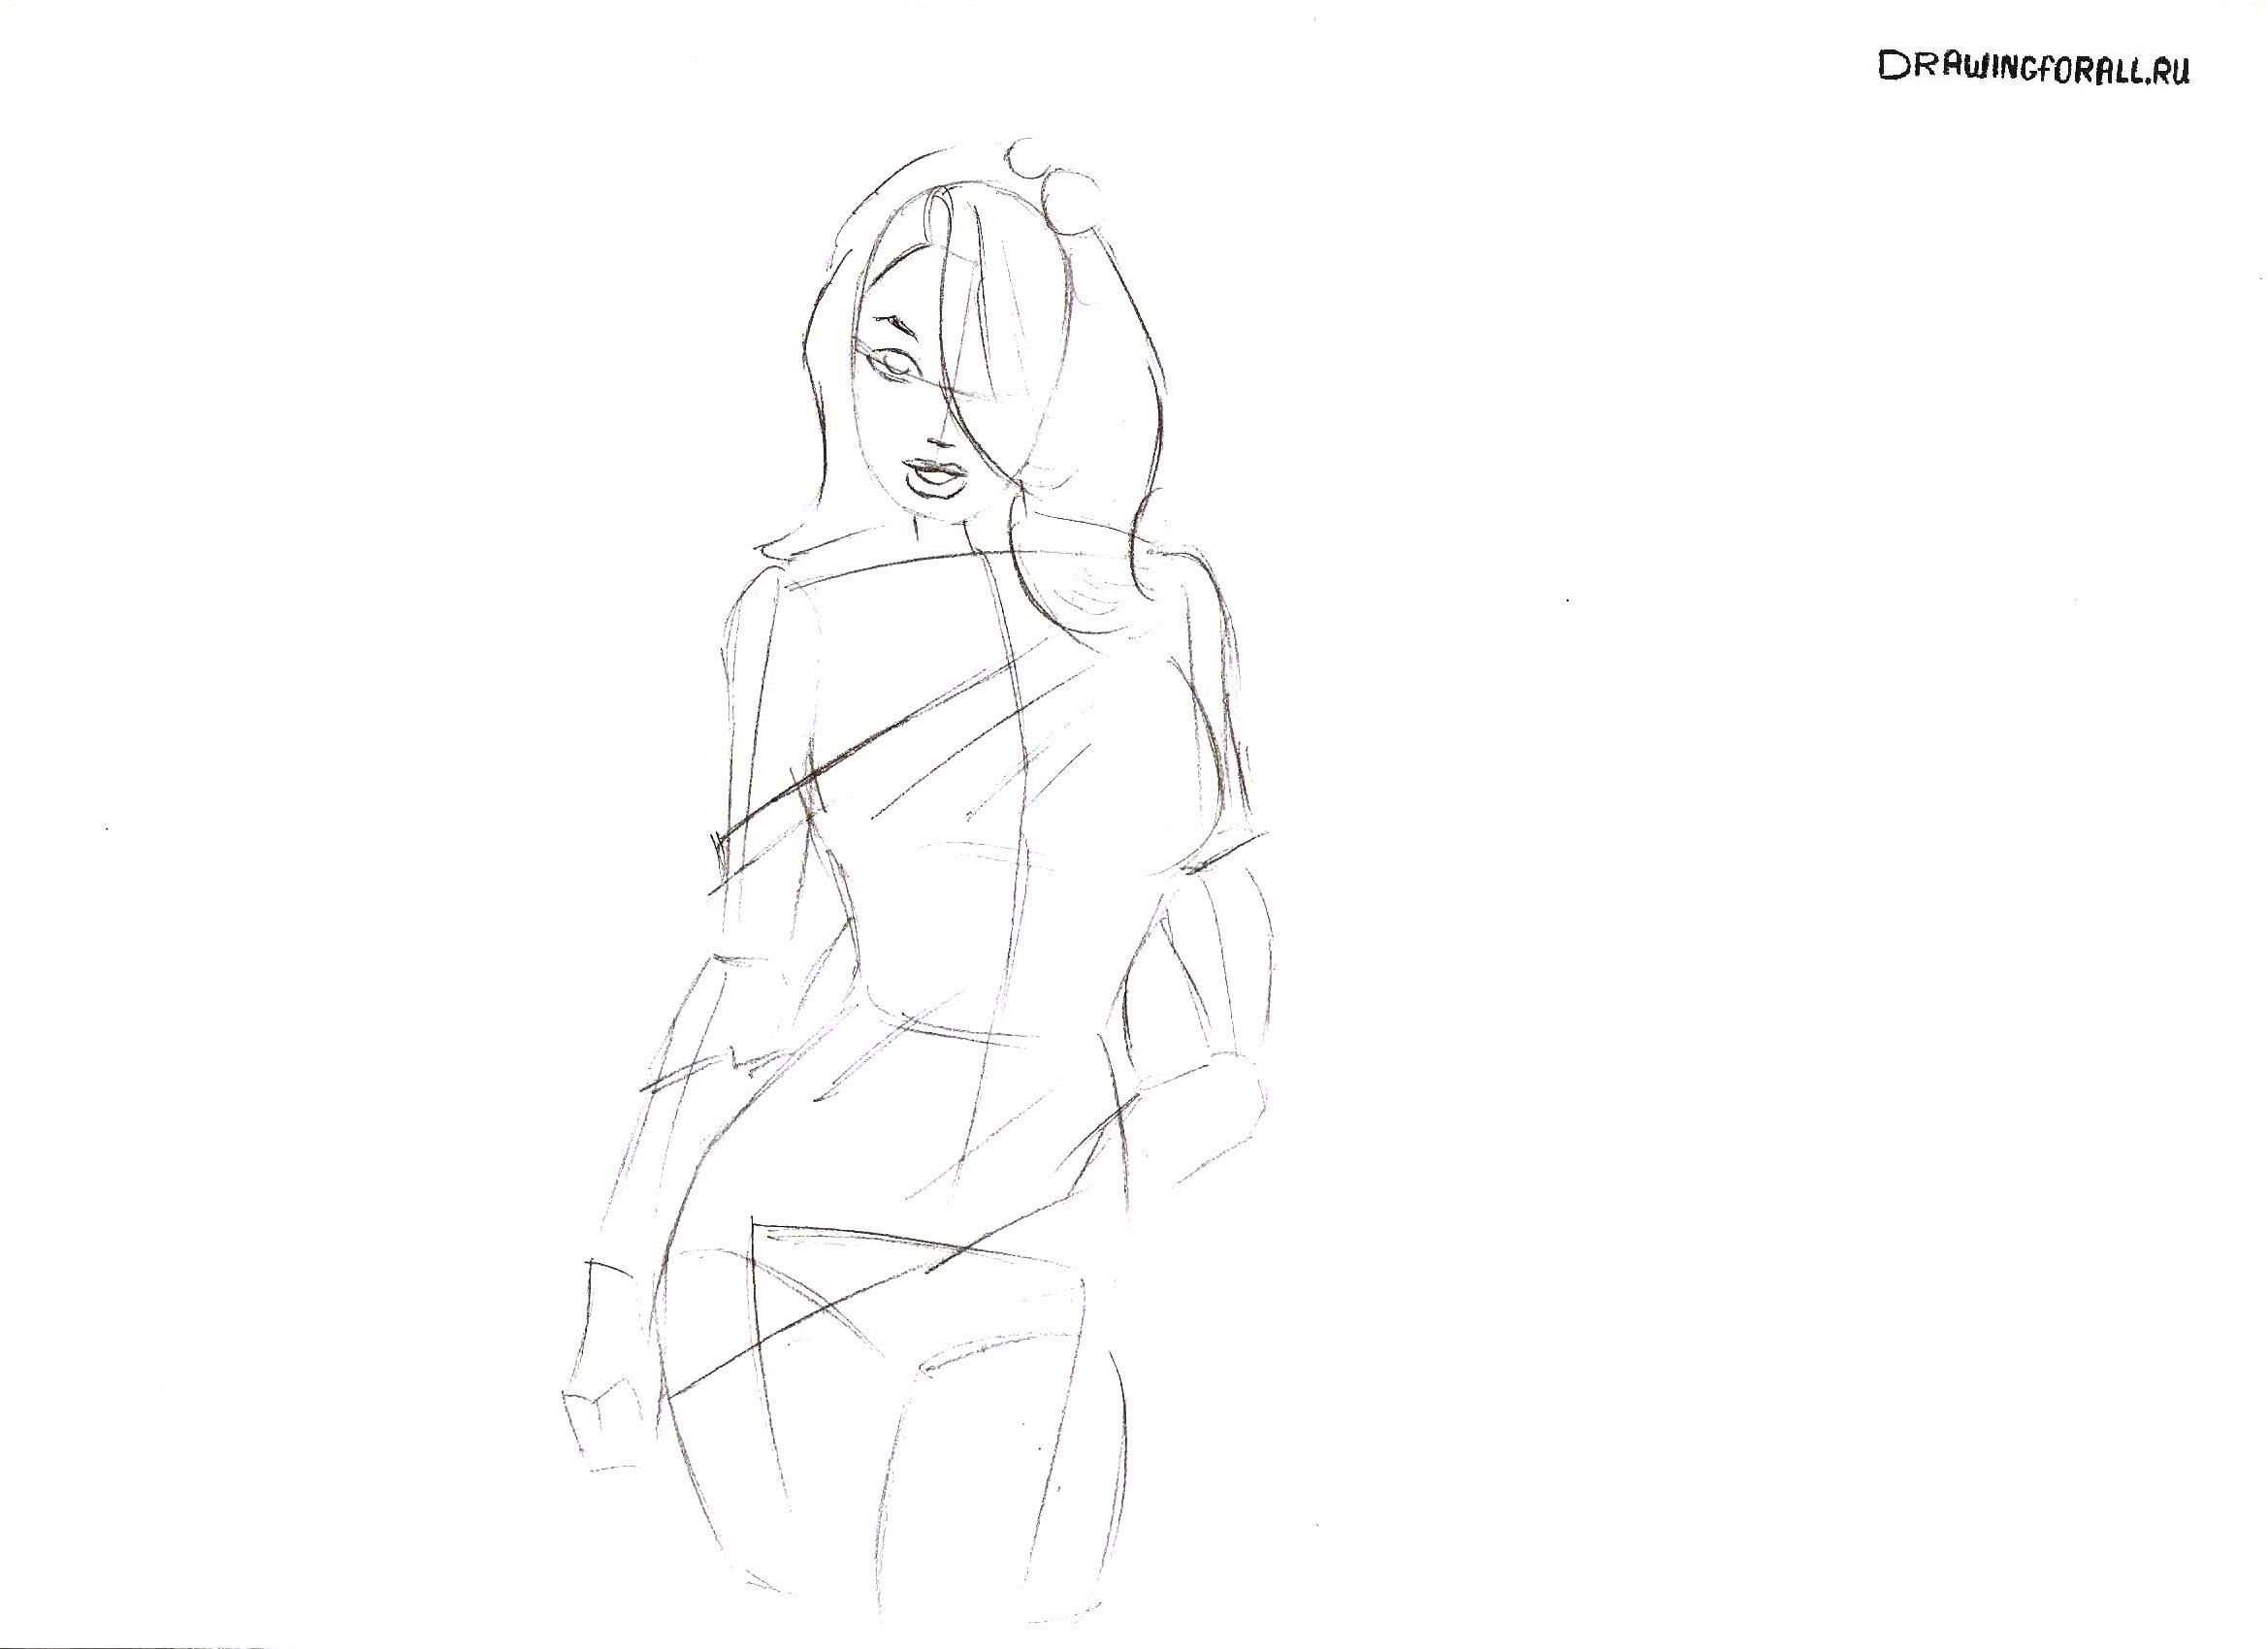 Пошлые рисунки карандашом поэтапно